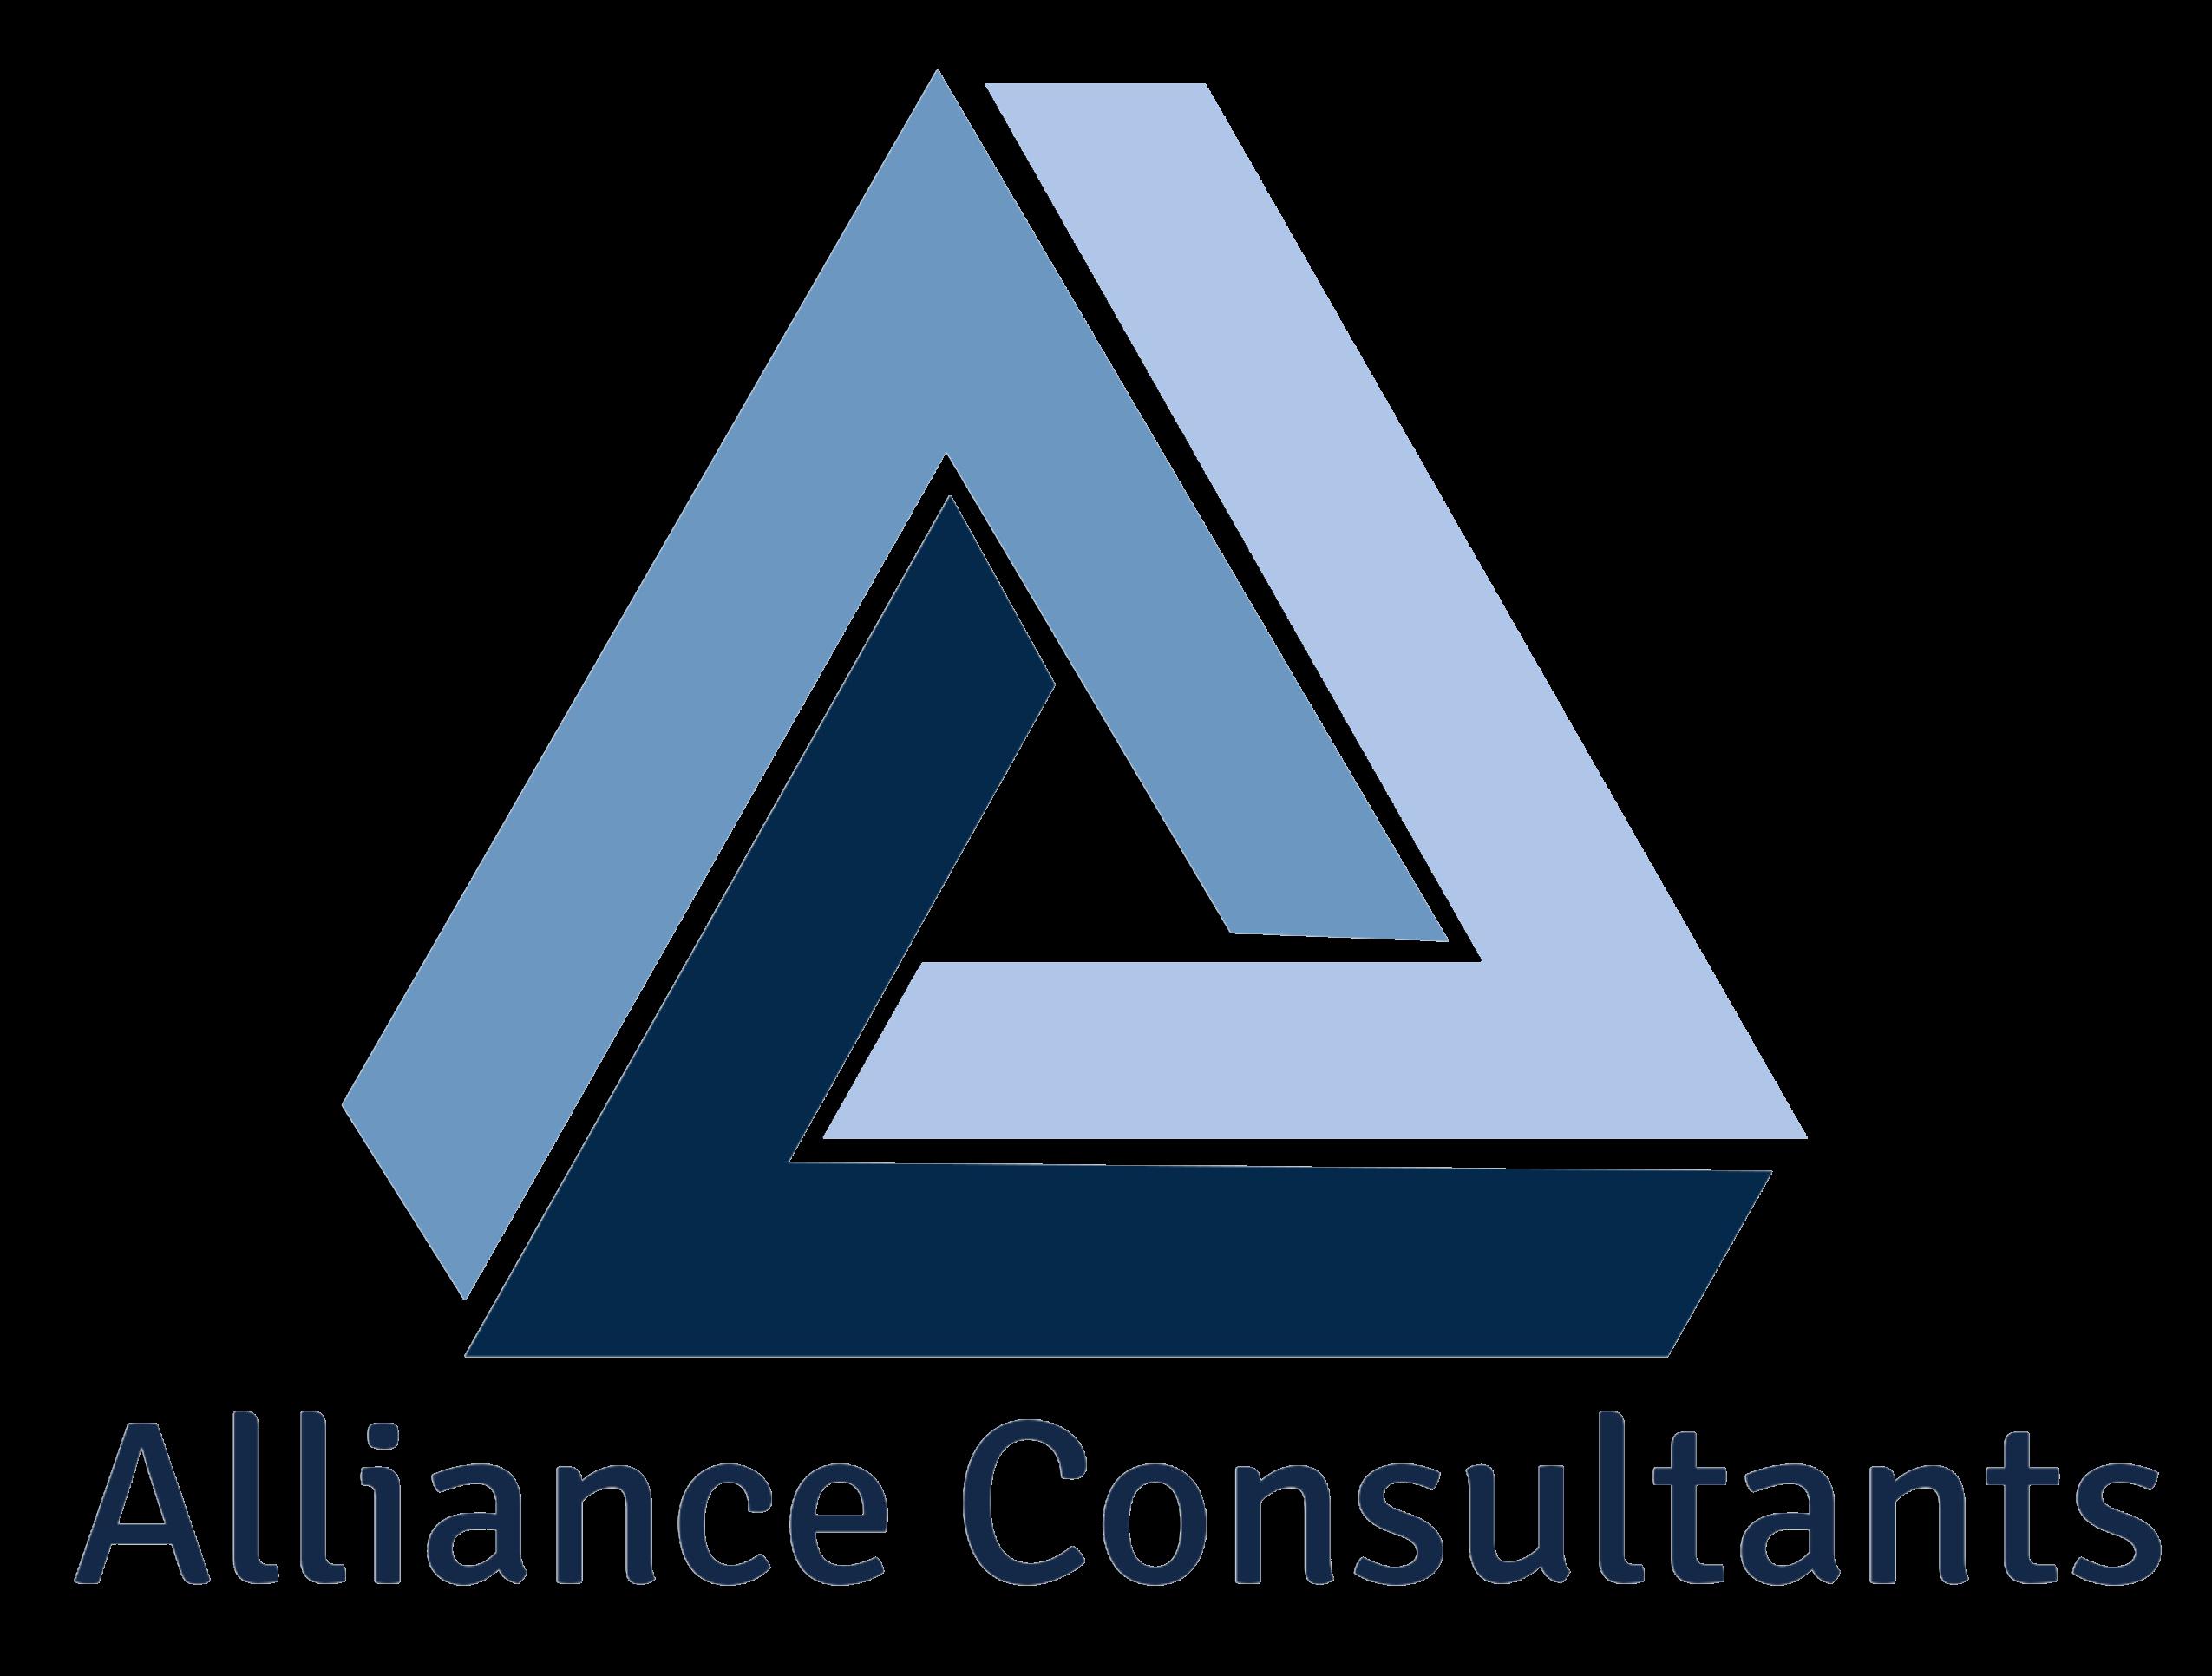 Alliance Consultants